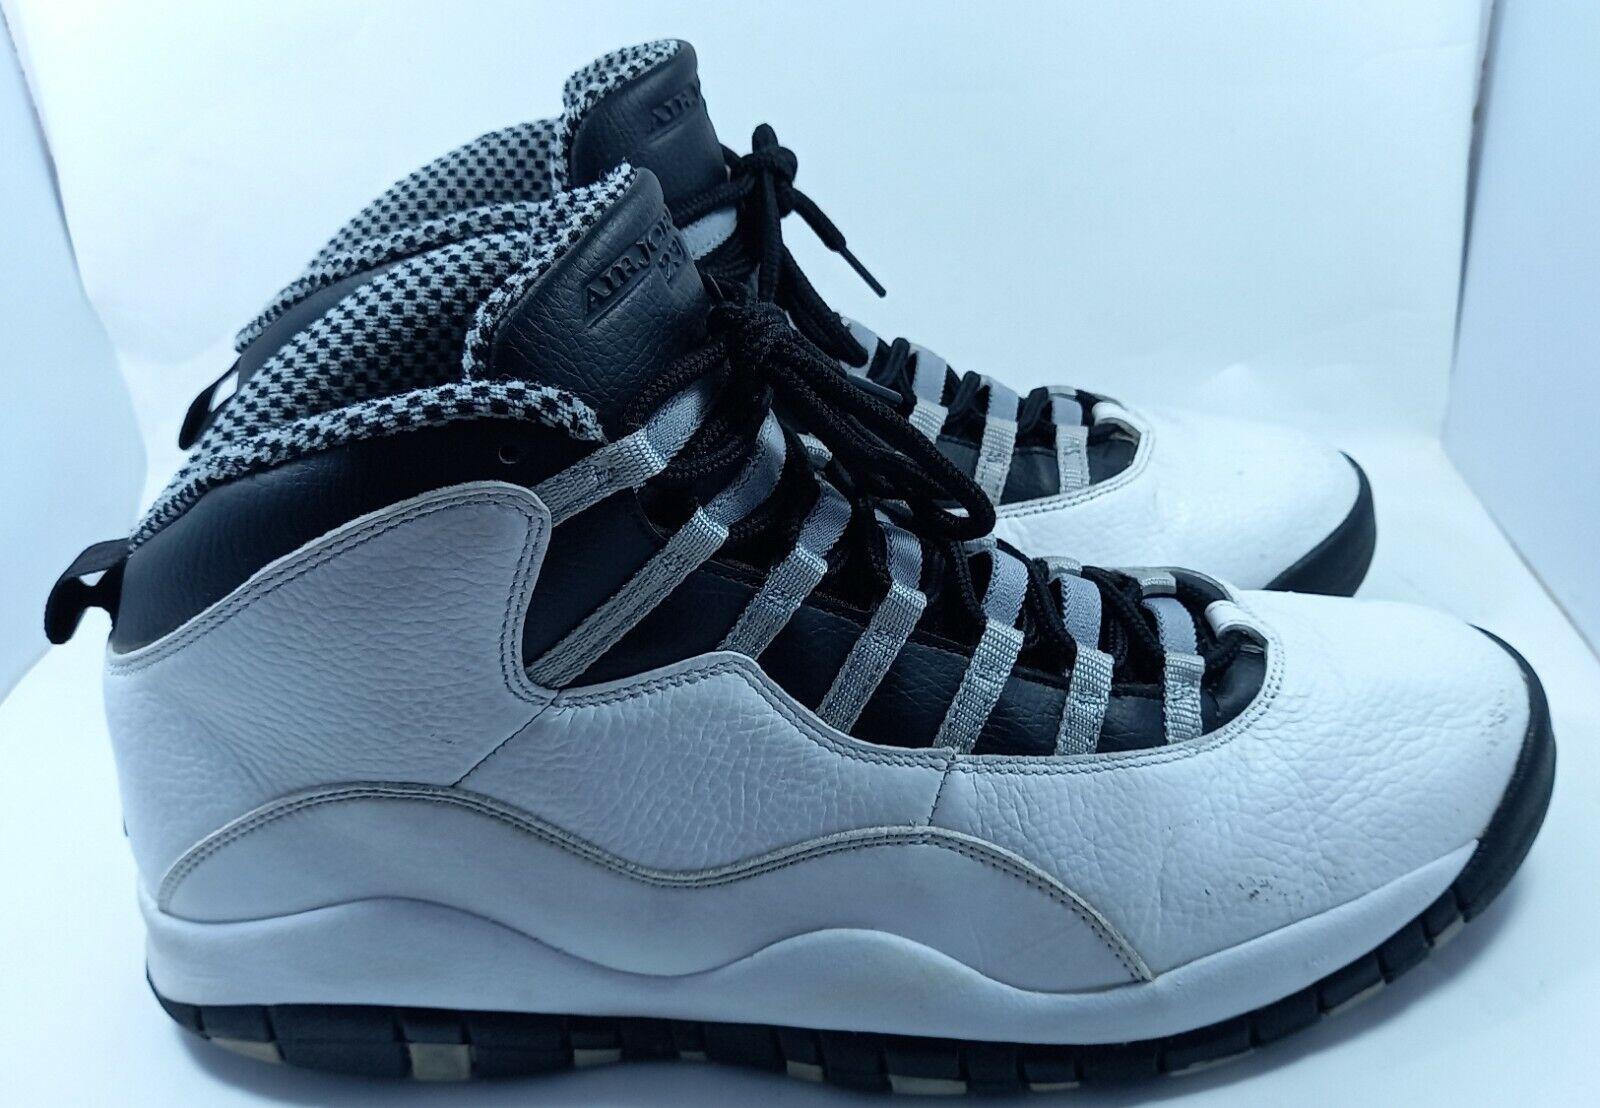 Nike Air Jordan X 10 Retro Steel Black